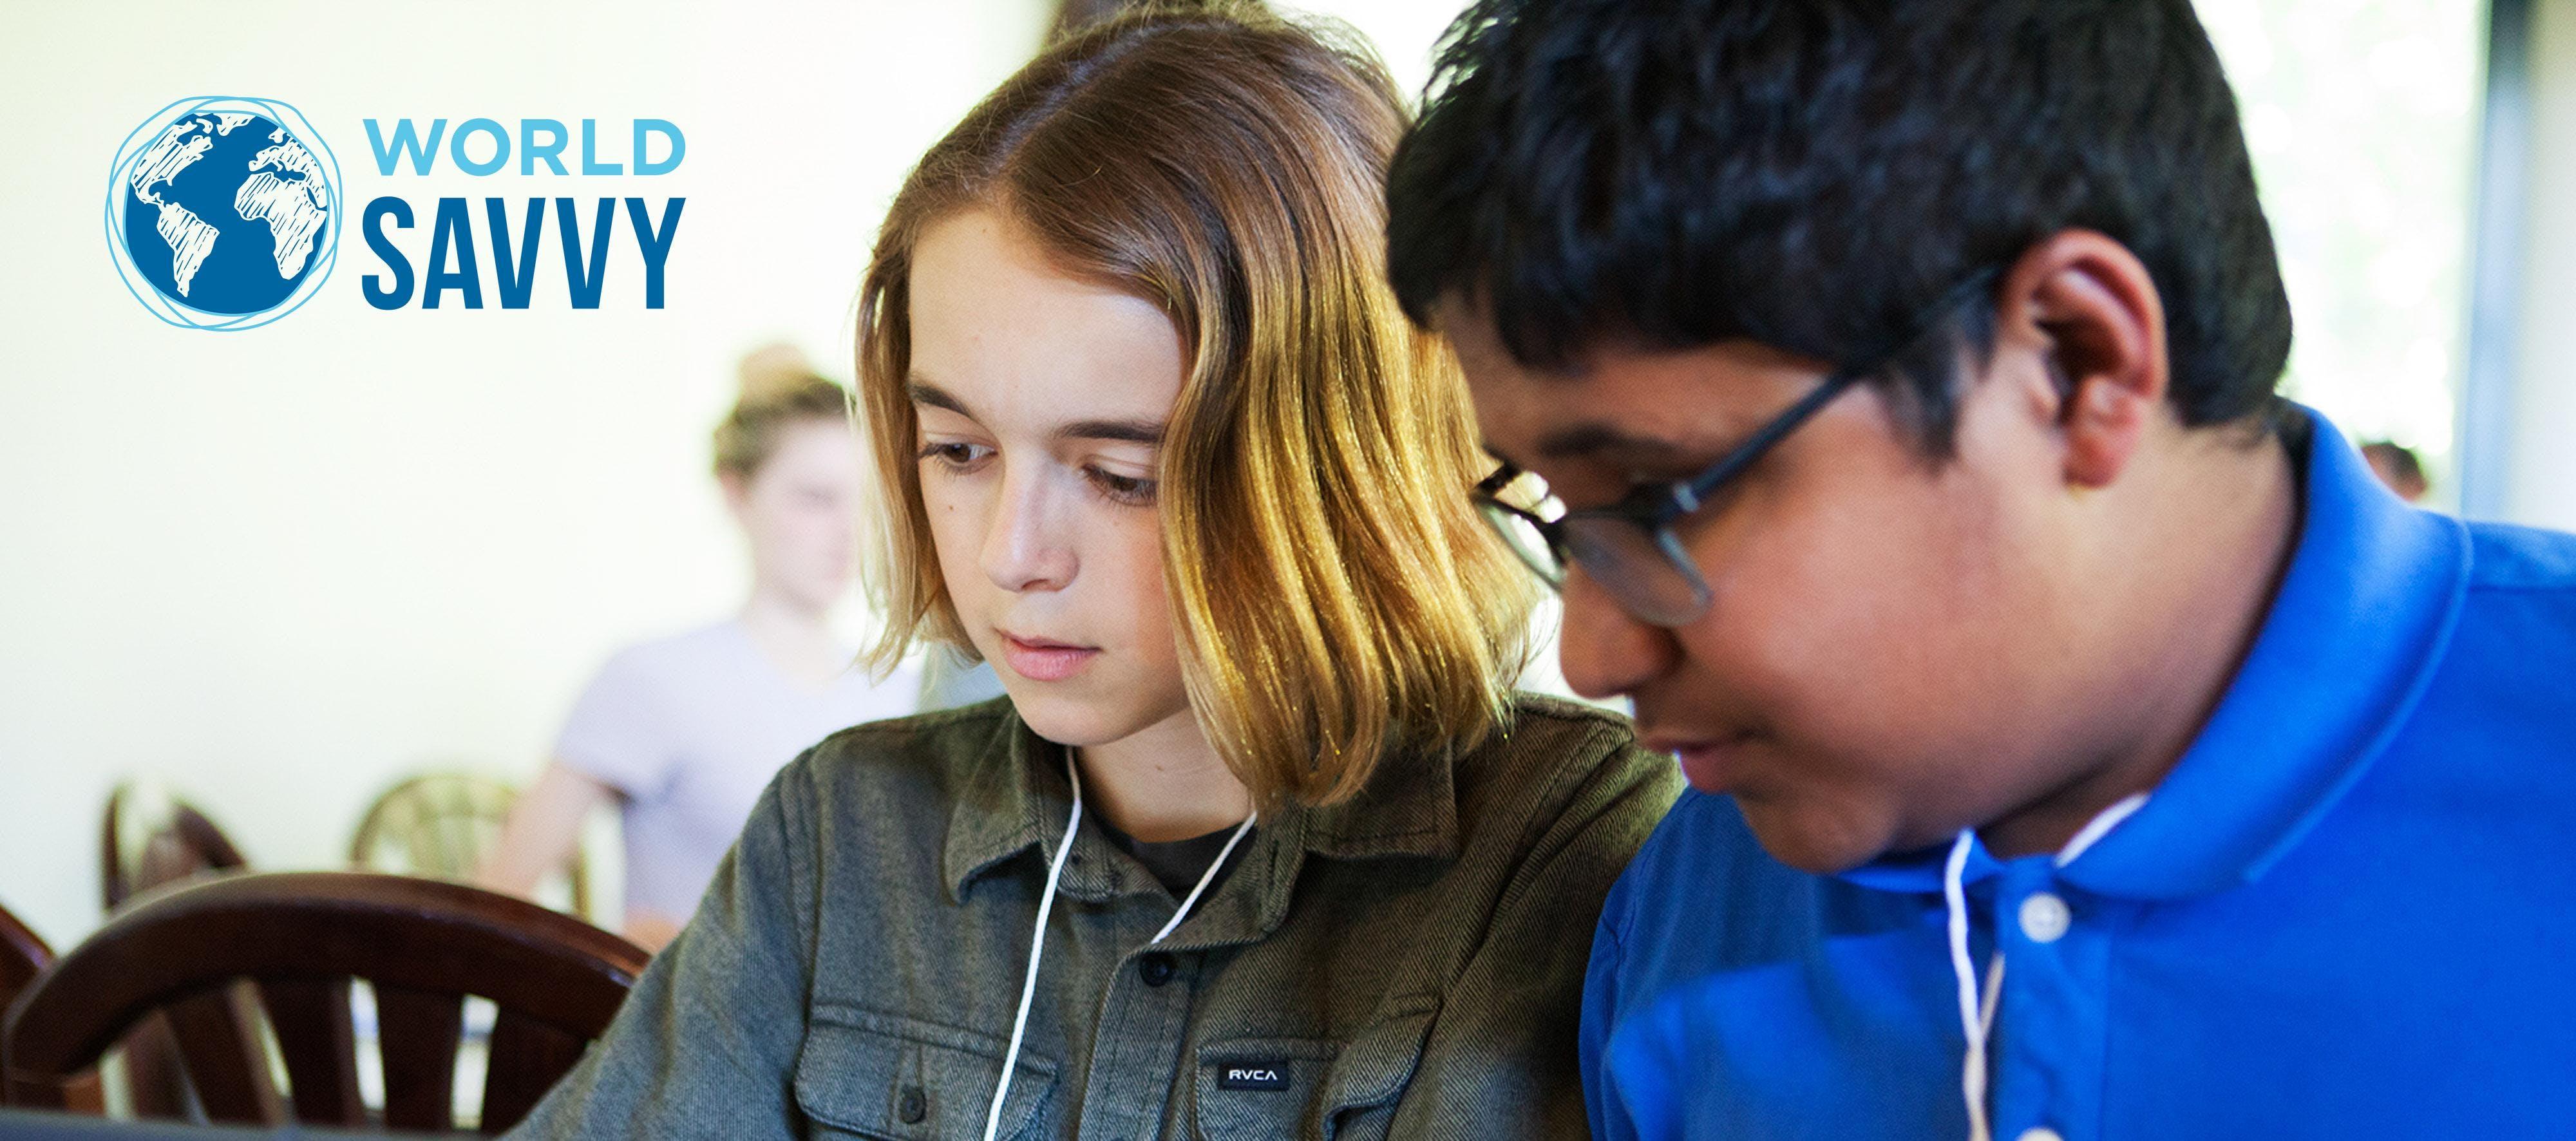 Twin Cities - 2018-19 World Savvy Classrooms Program